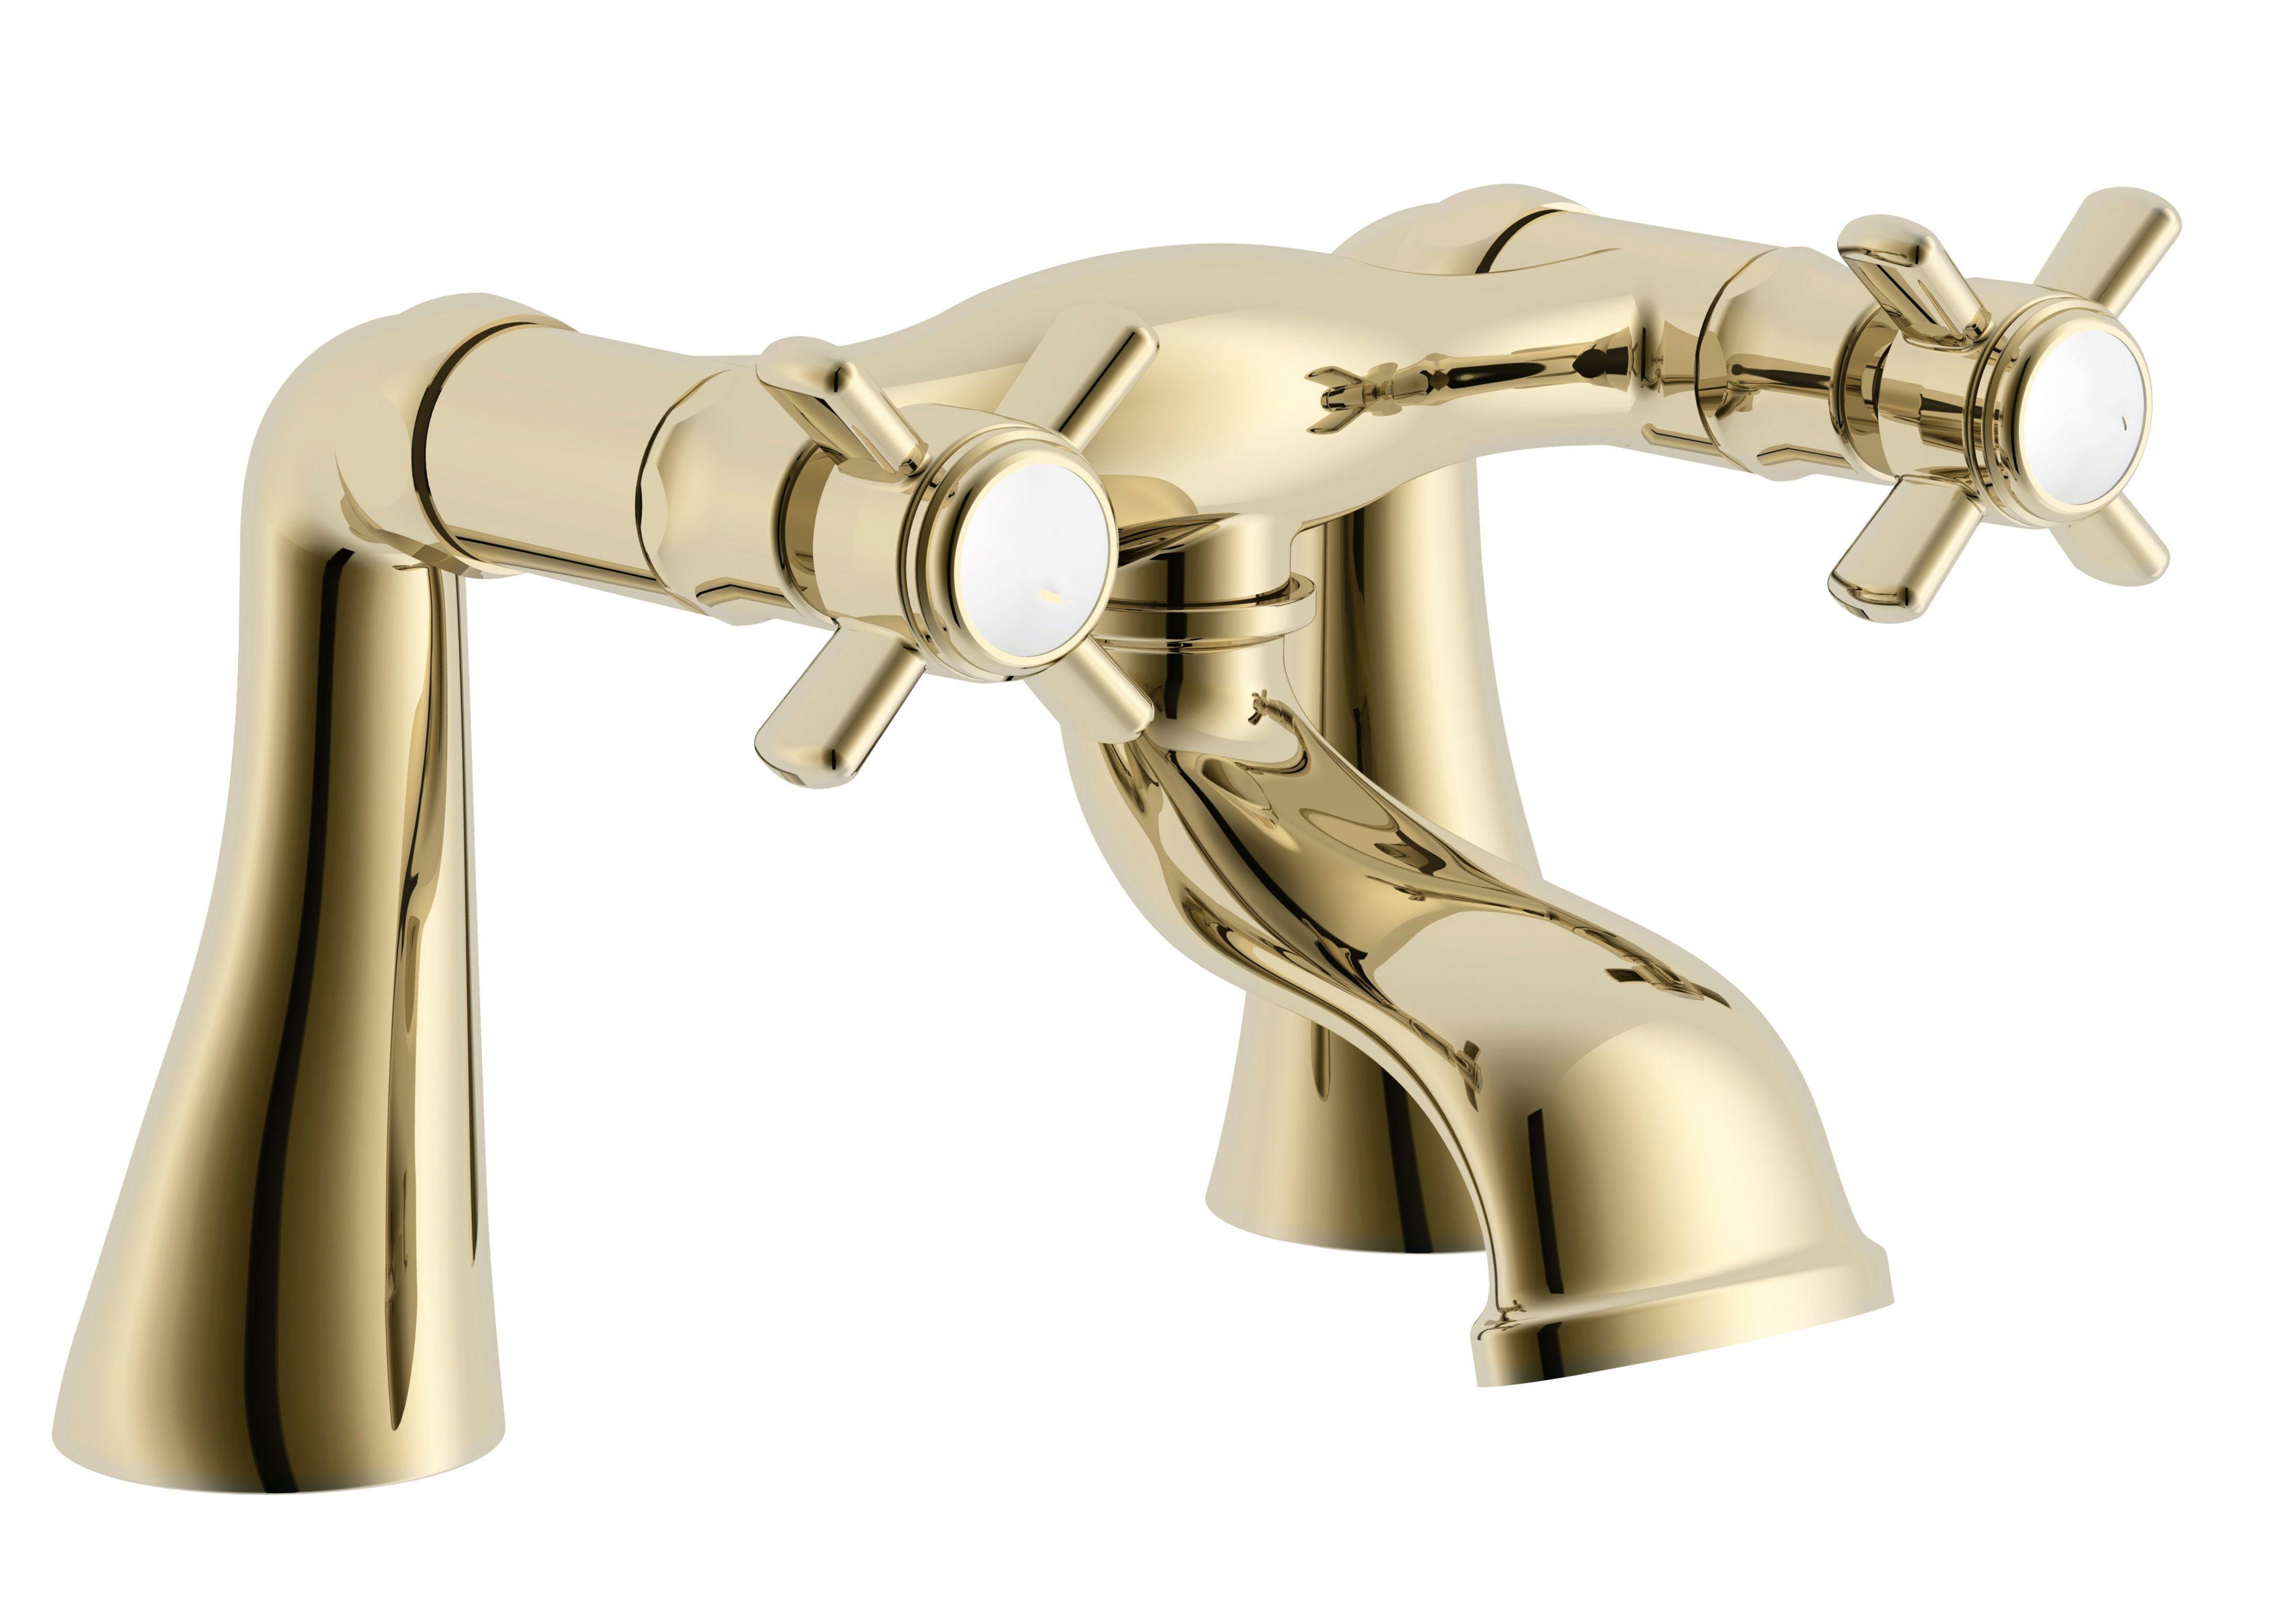 Cooke Amp Lewis Classic Gold Effect Bath Mixer Tap